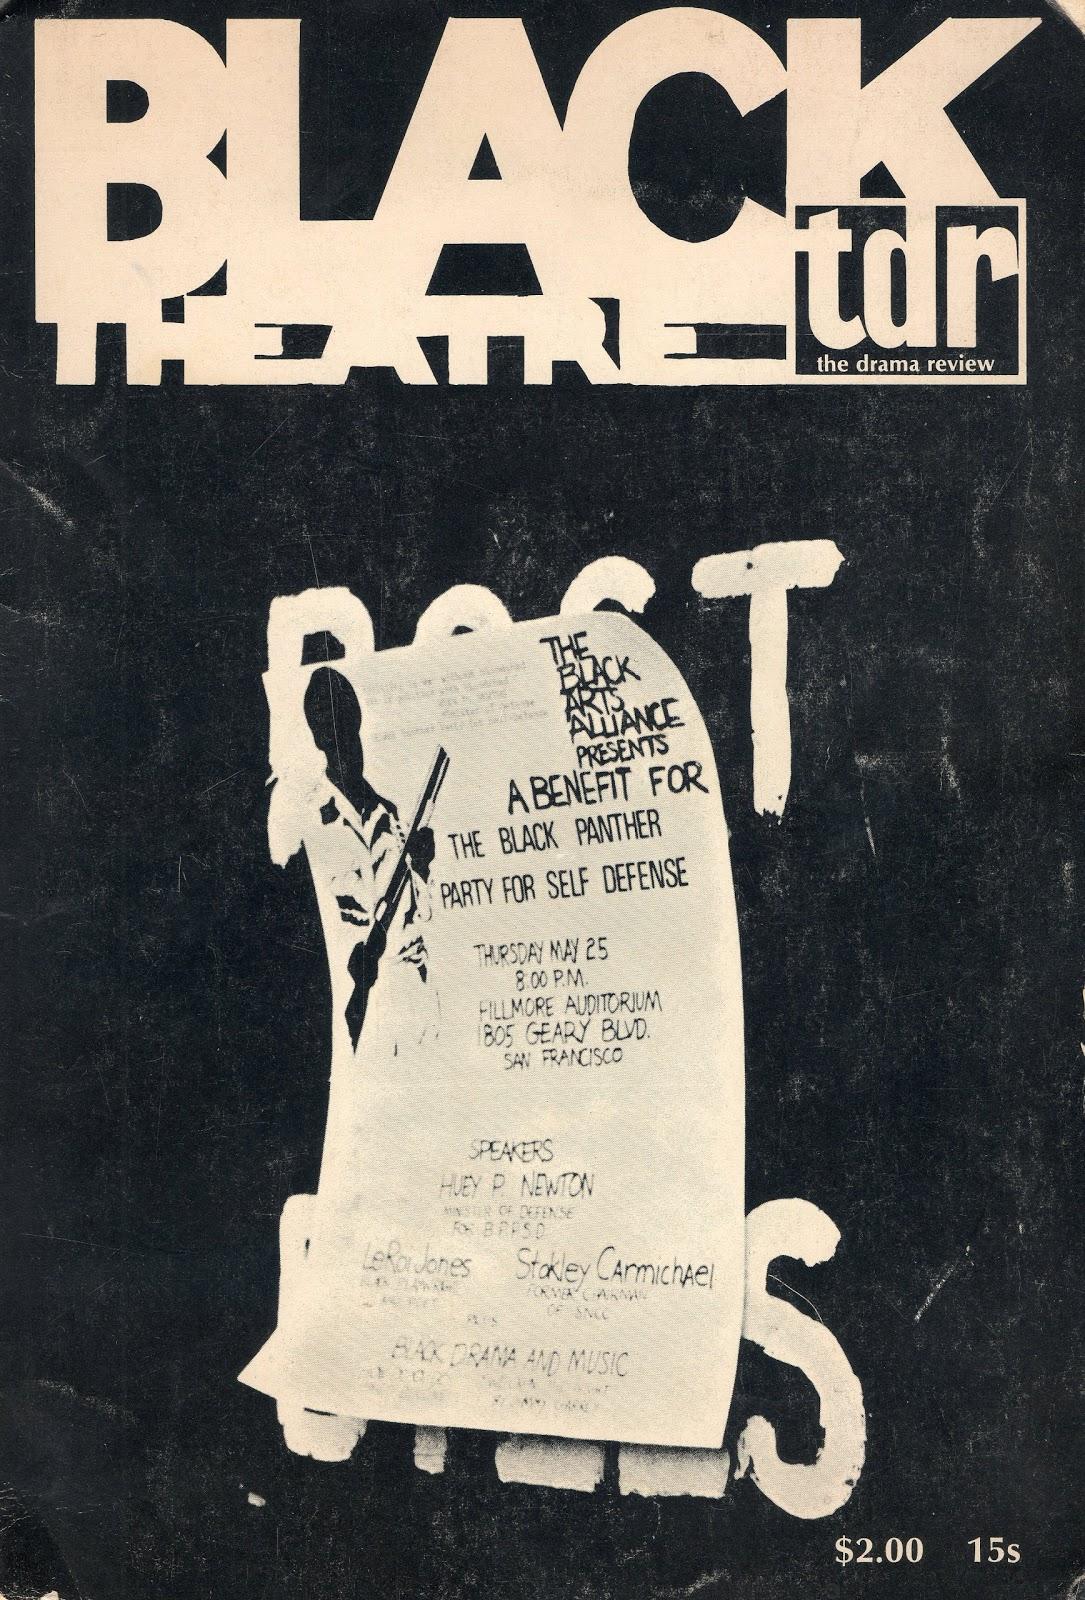 The Black Panther Party, Black Drama, & Black Arts Poets